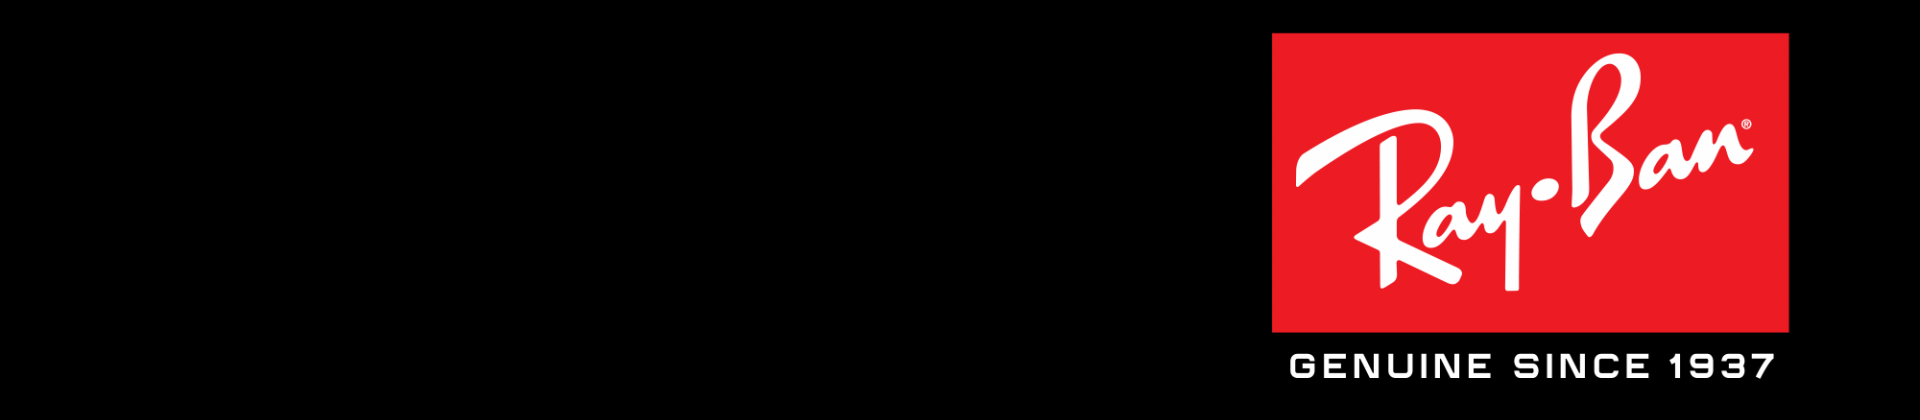 Rayban banner